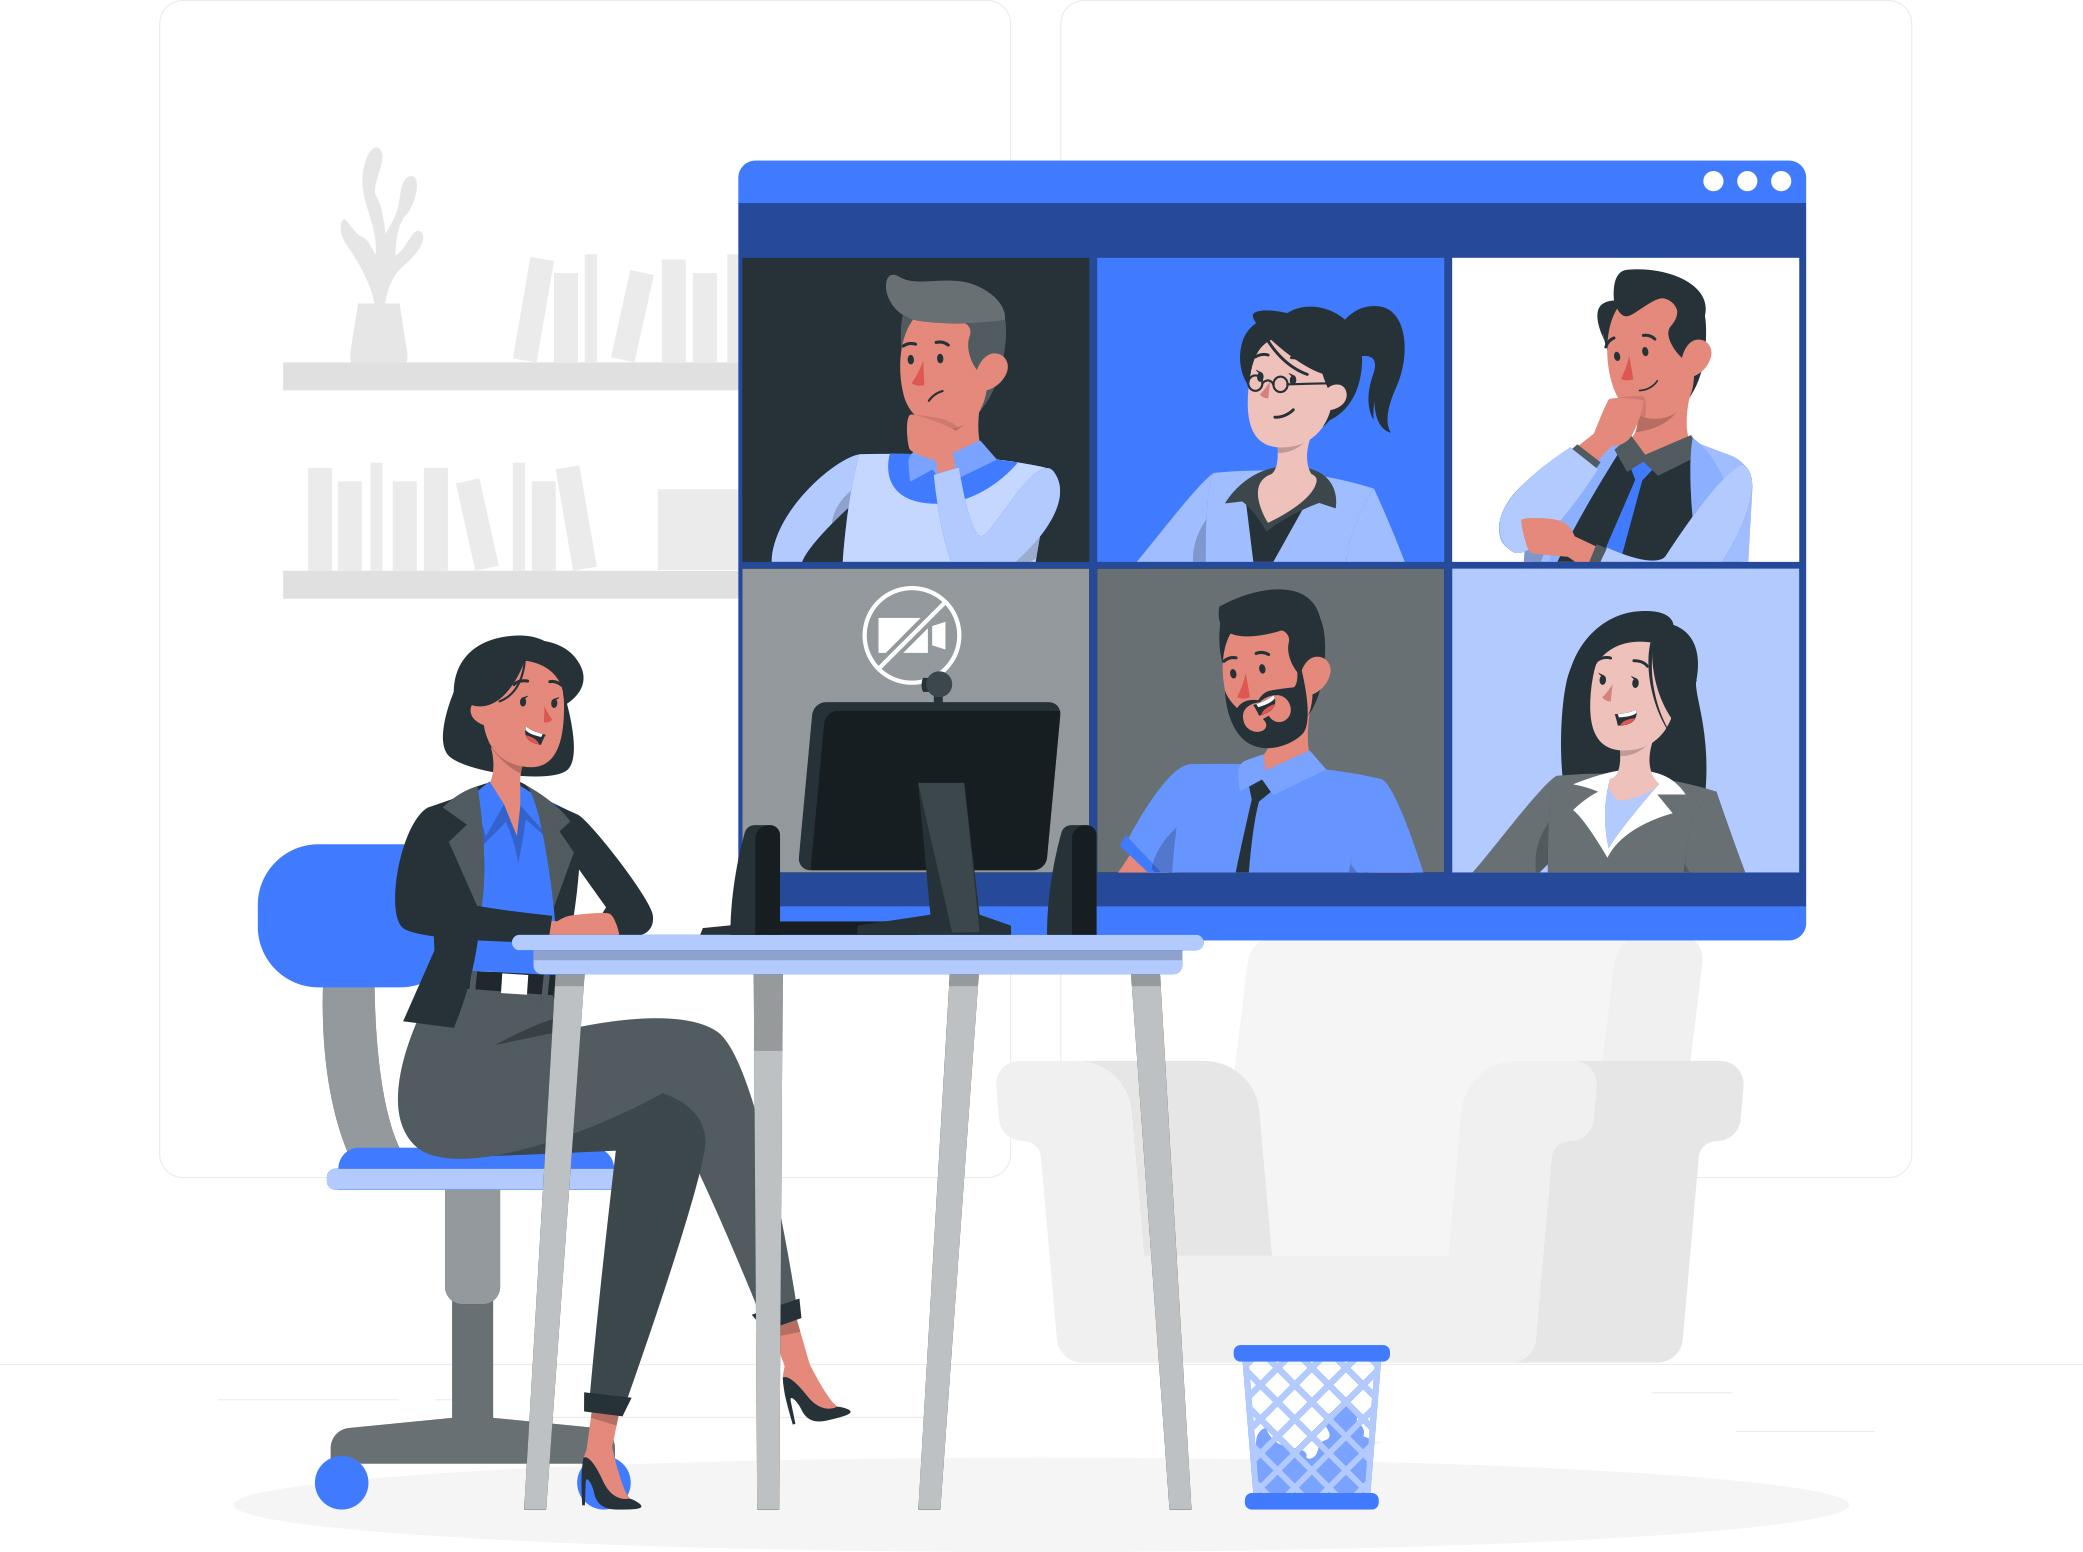 Webinar o meeting online ?